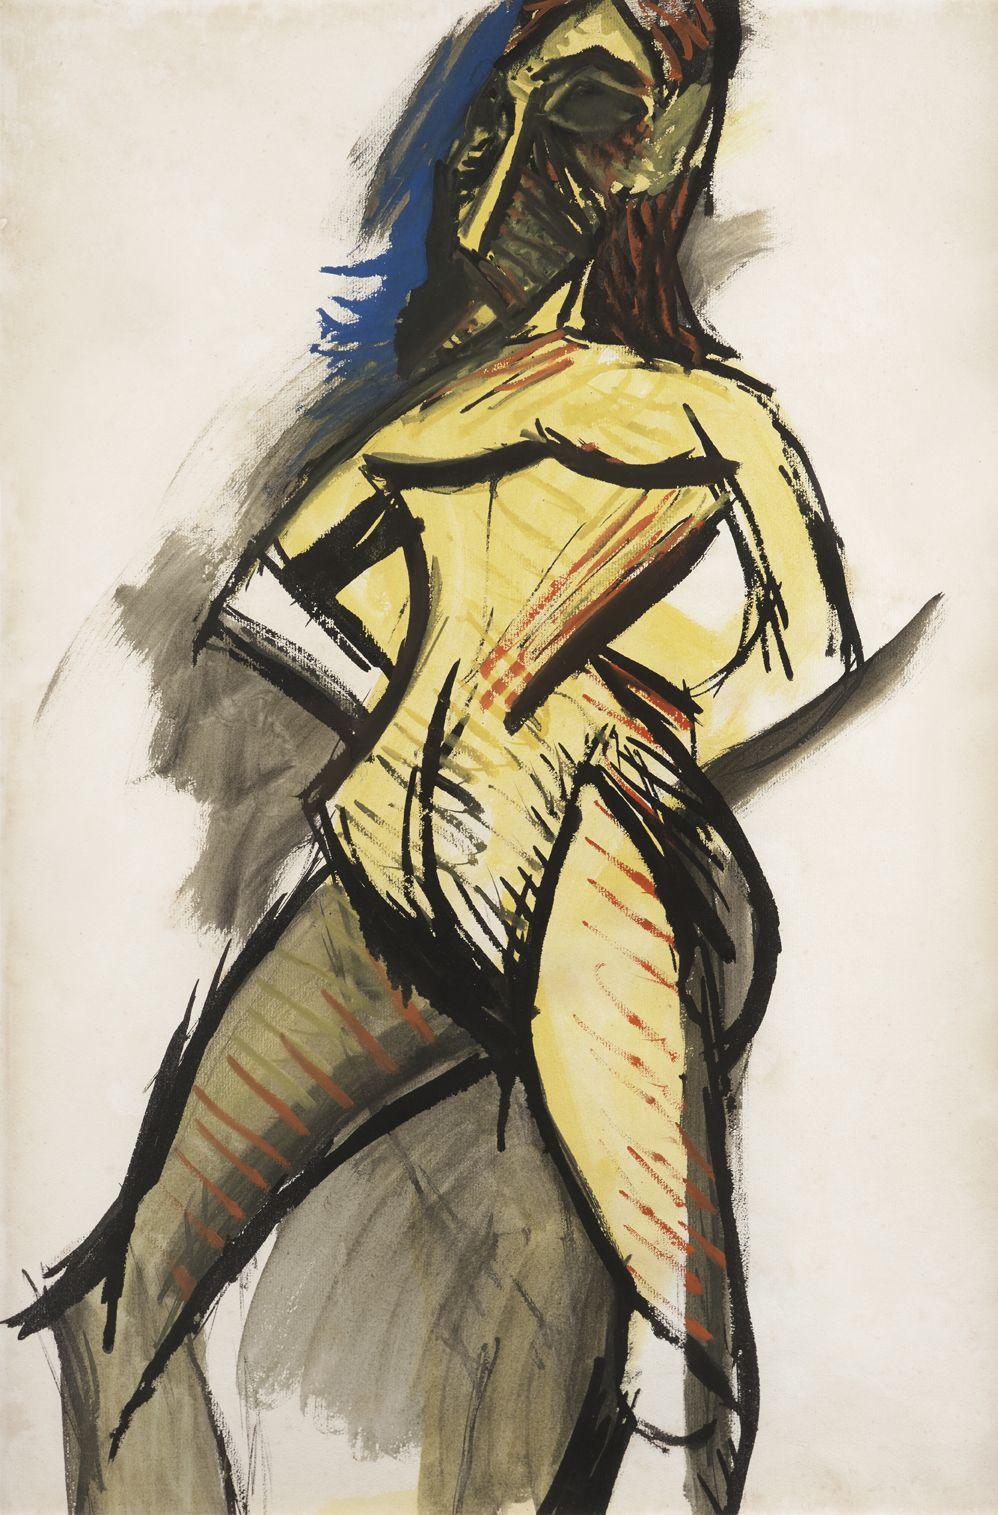 Pablo Picasso, Le Nu Jaune, 1907